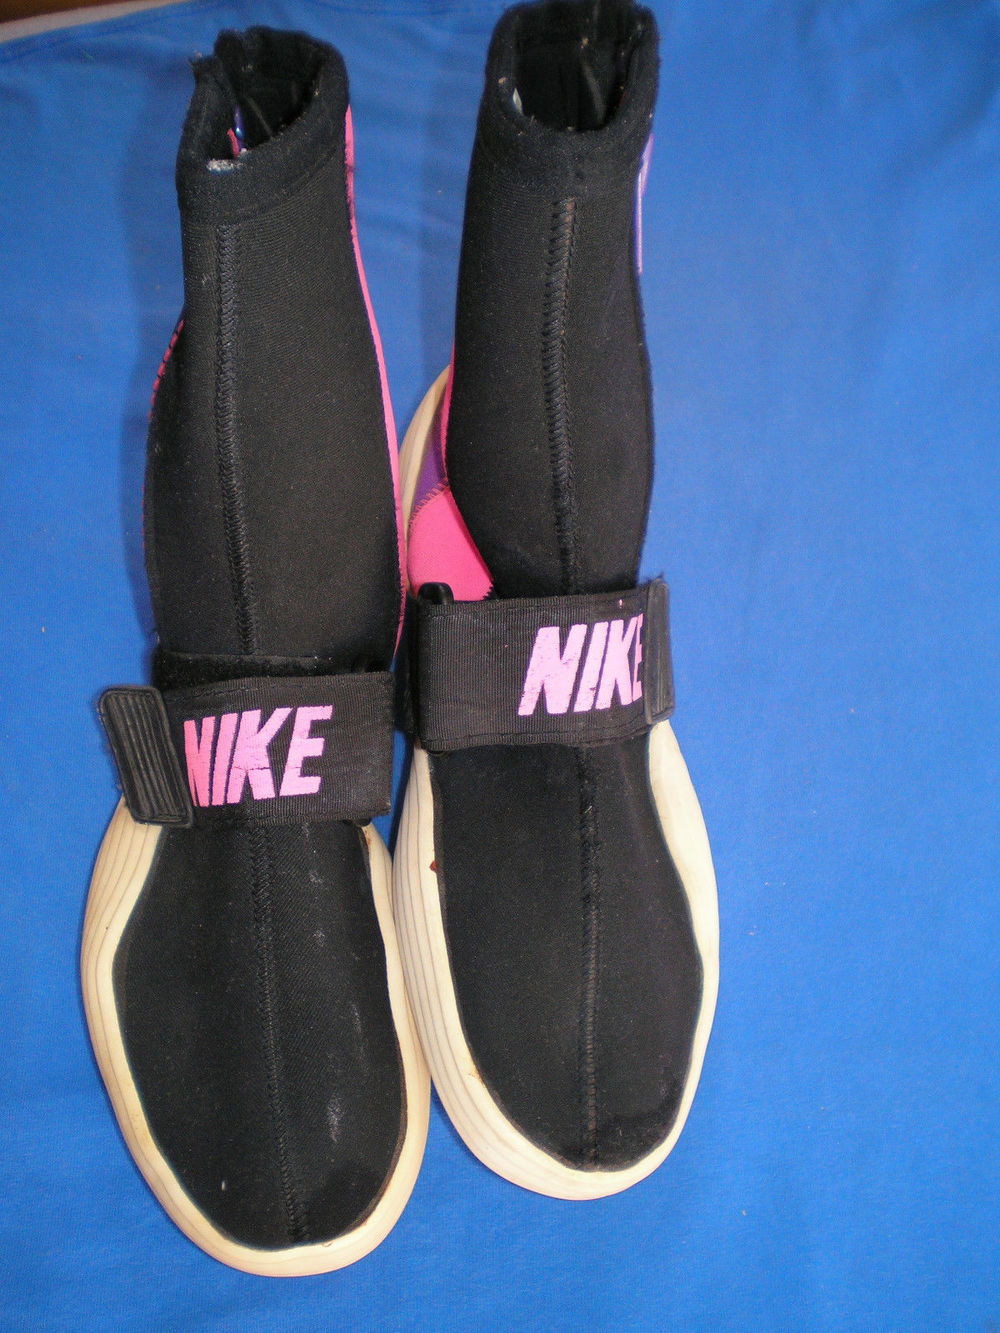 Vintage-Nike-Water-Shoes-Inspired-Kanye-West-Adidas-Yeezy-Boost-1.jpg